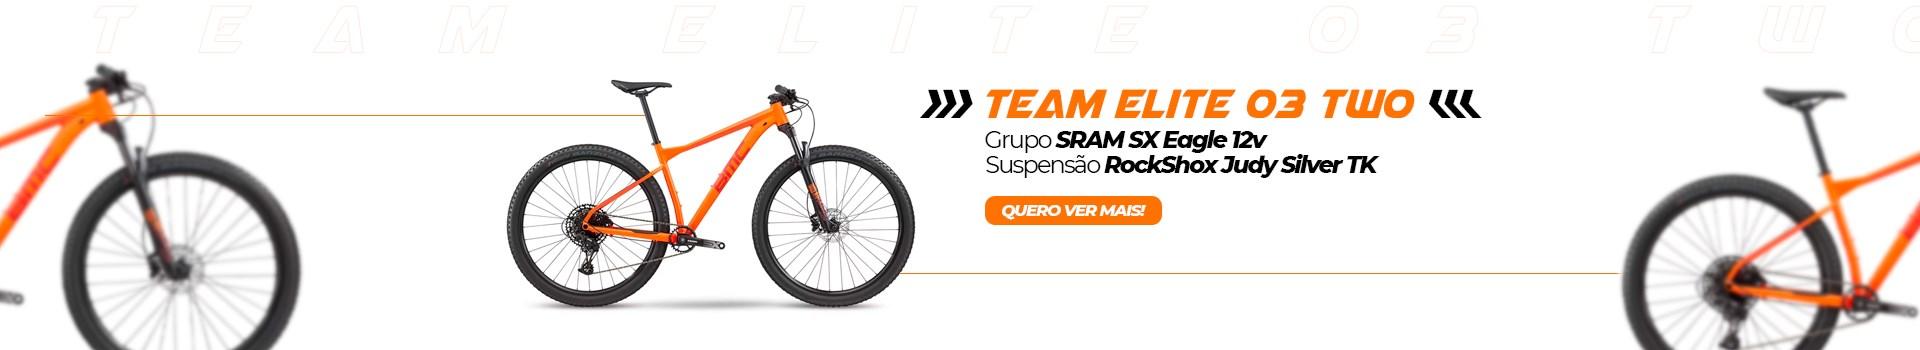 "BIKE BMC TEAM ELITE 03 TWO SRAM SX EAGLE ARO 29"" 2020 LARANJA"